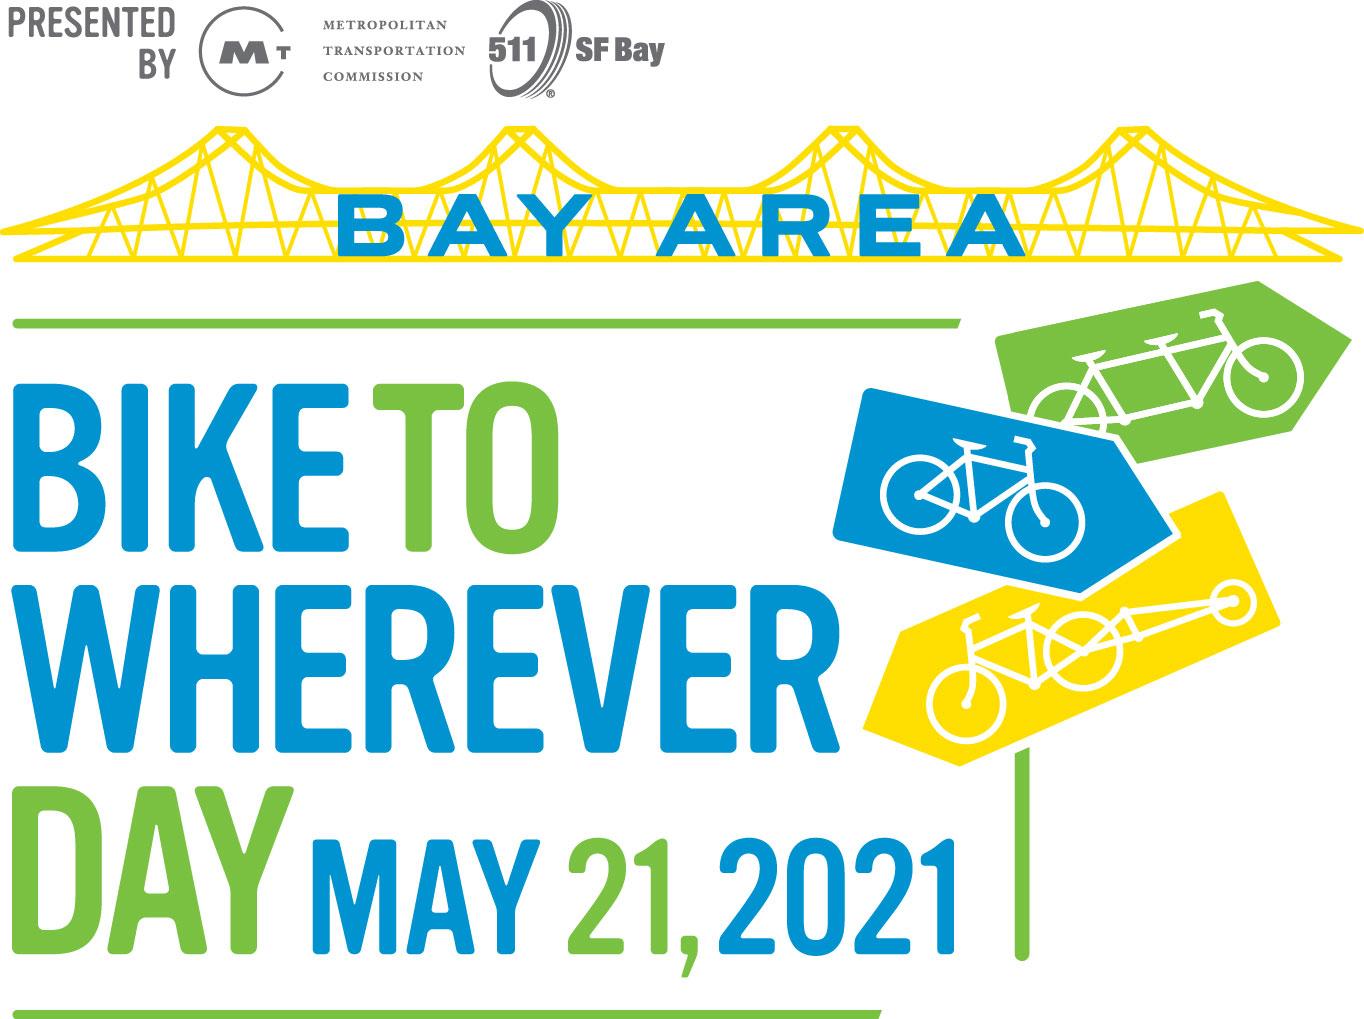 Bike wherever day 2021